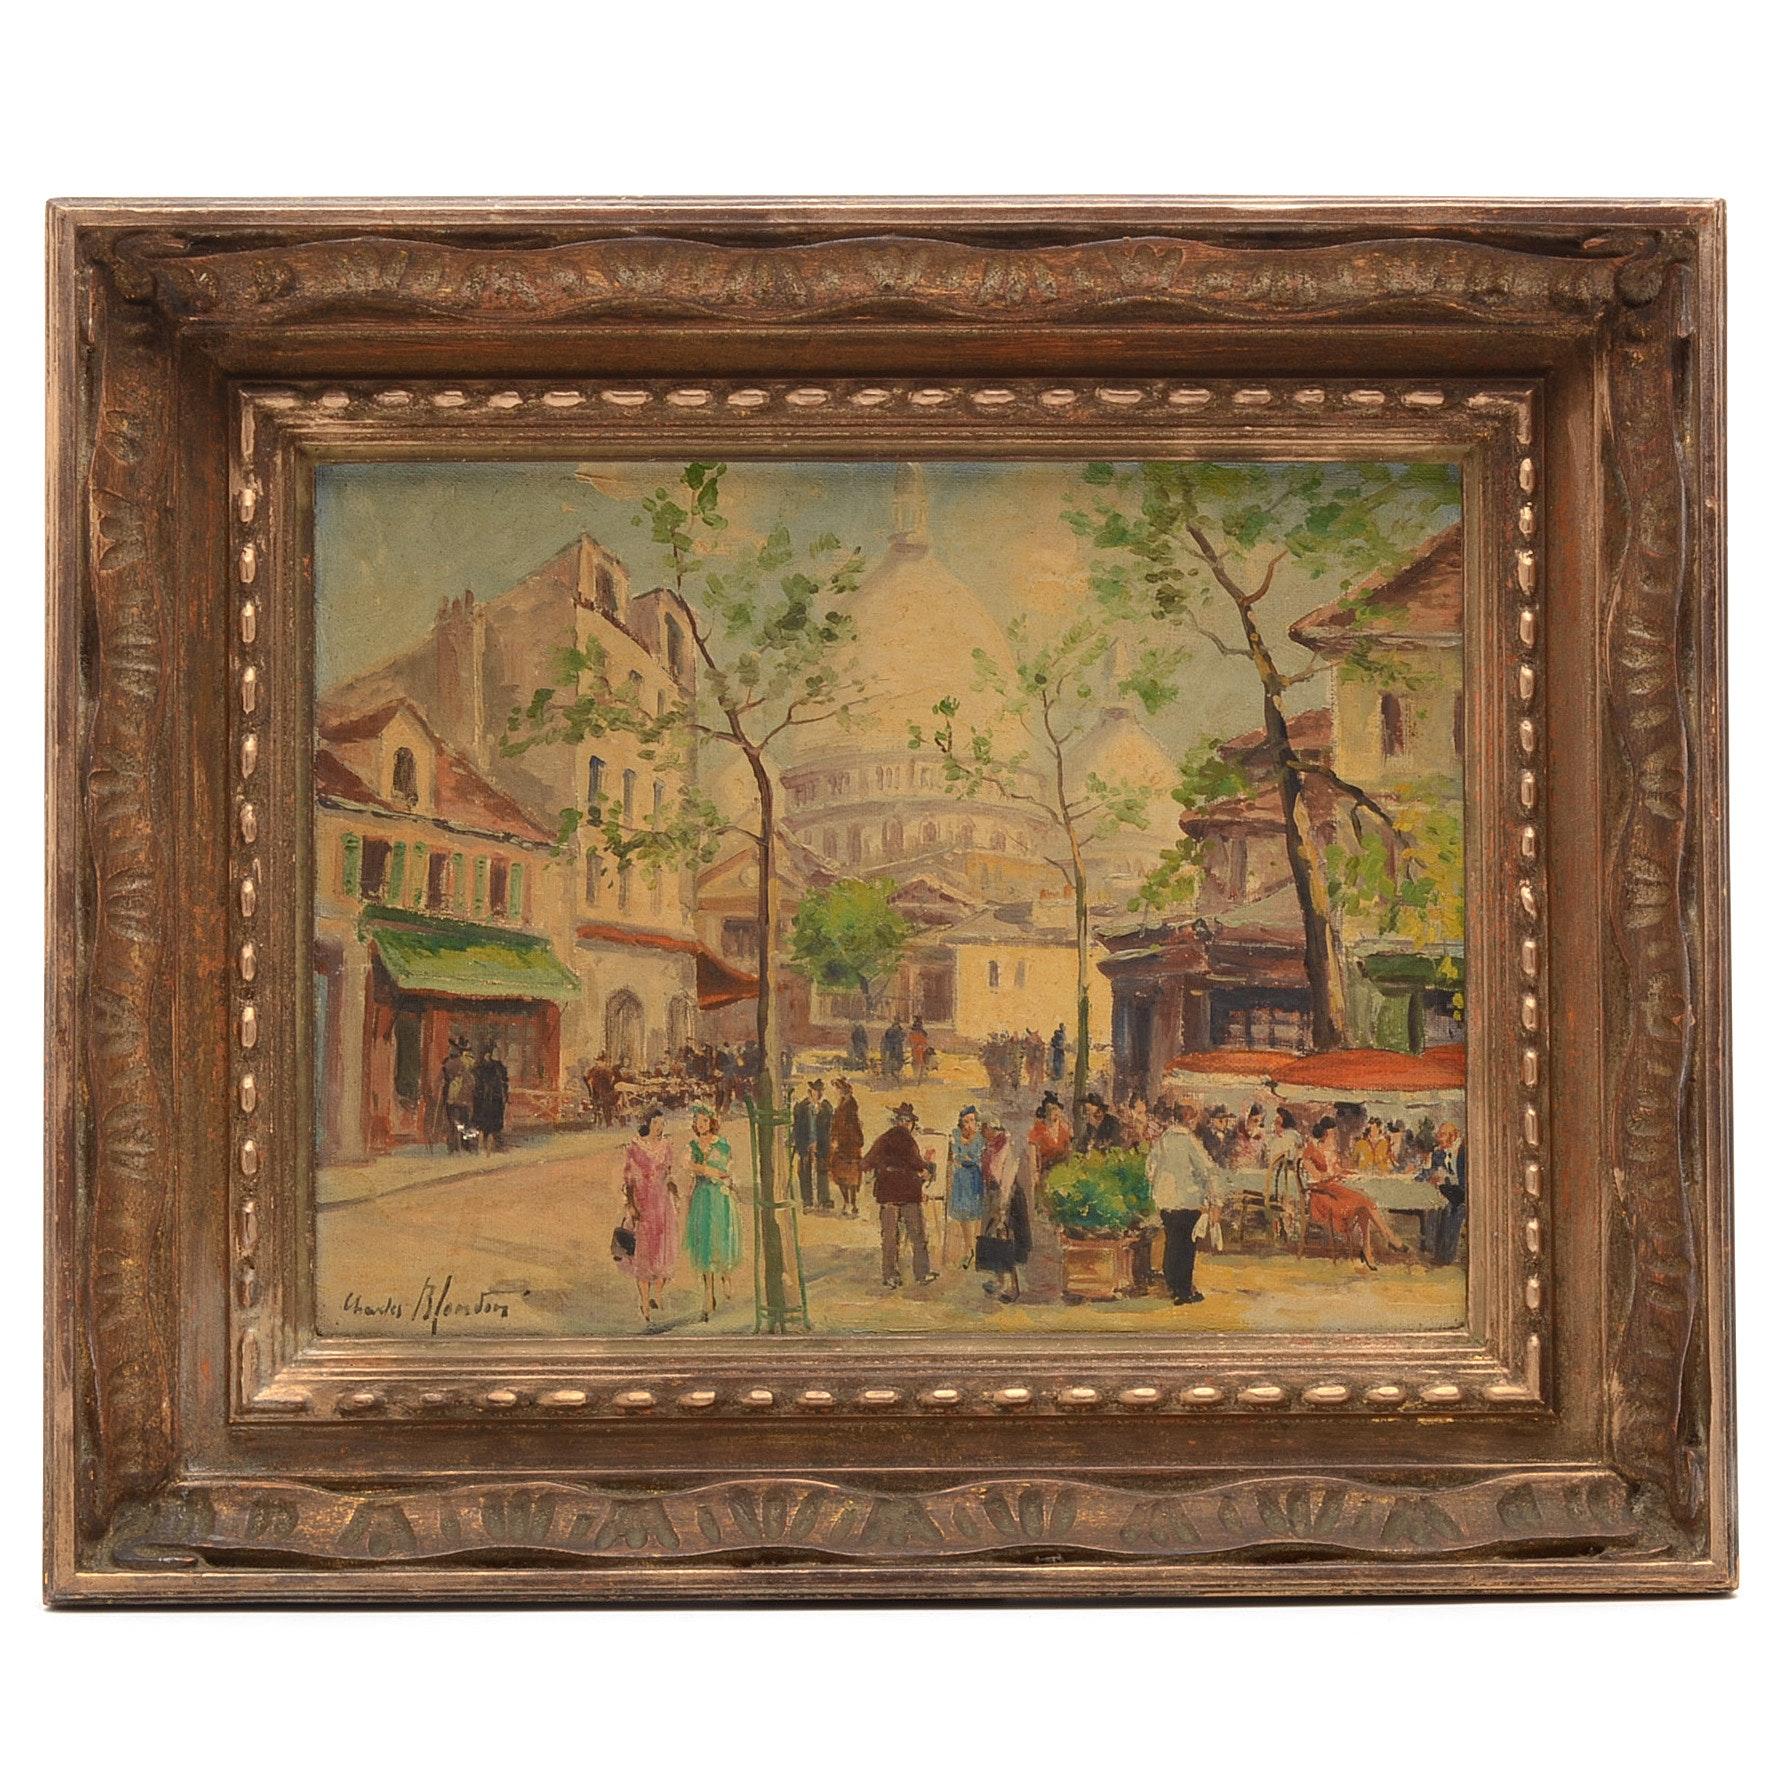 Charles Blondin Original Oil on Canvas of Parisian Street Scene